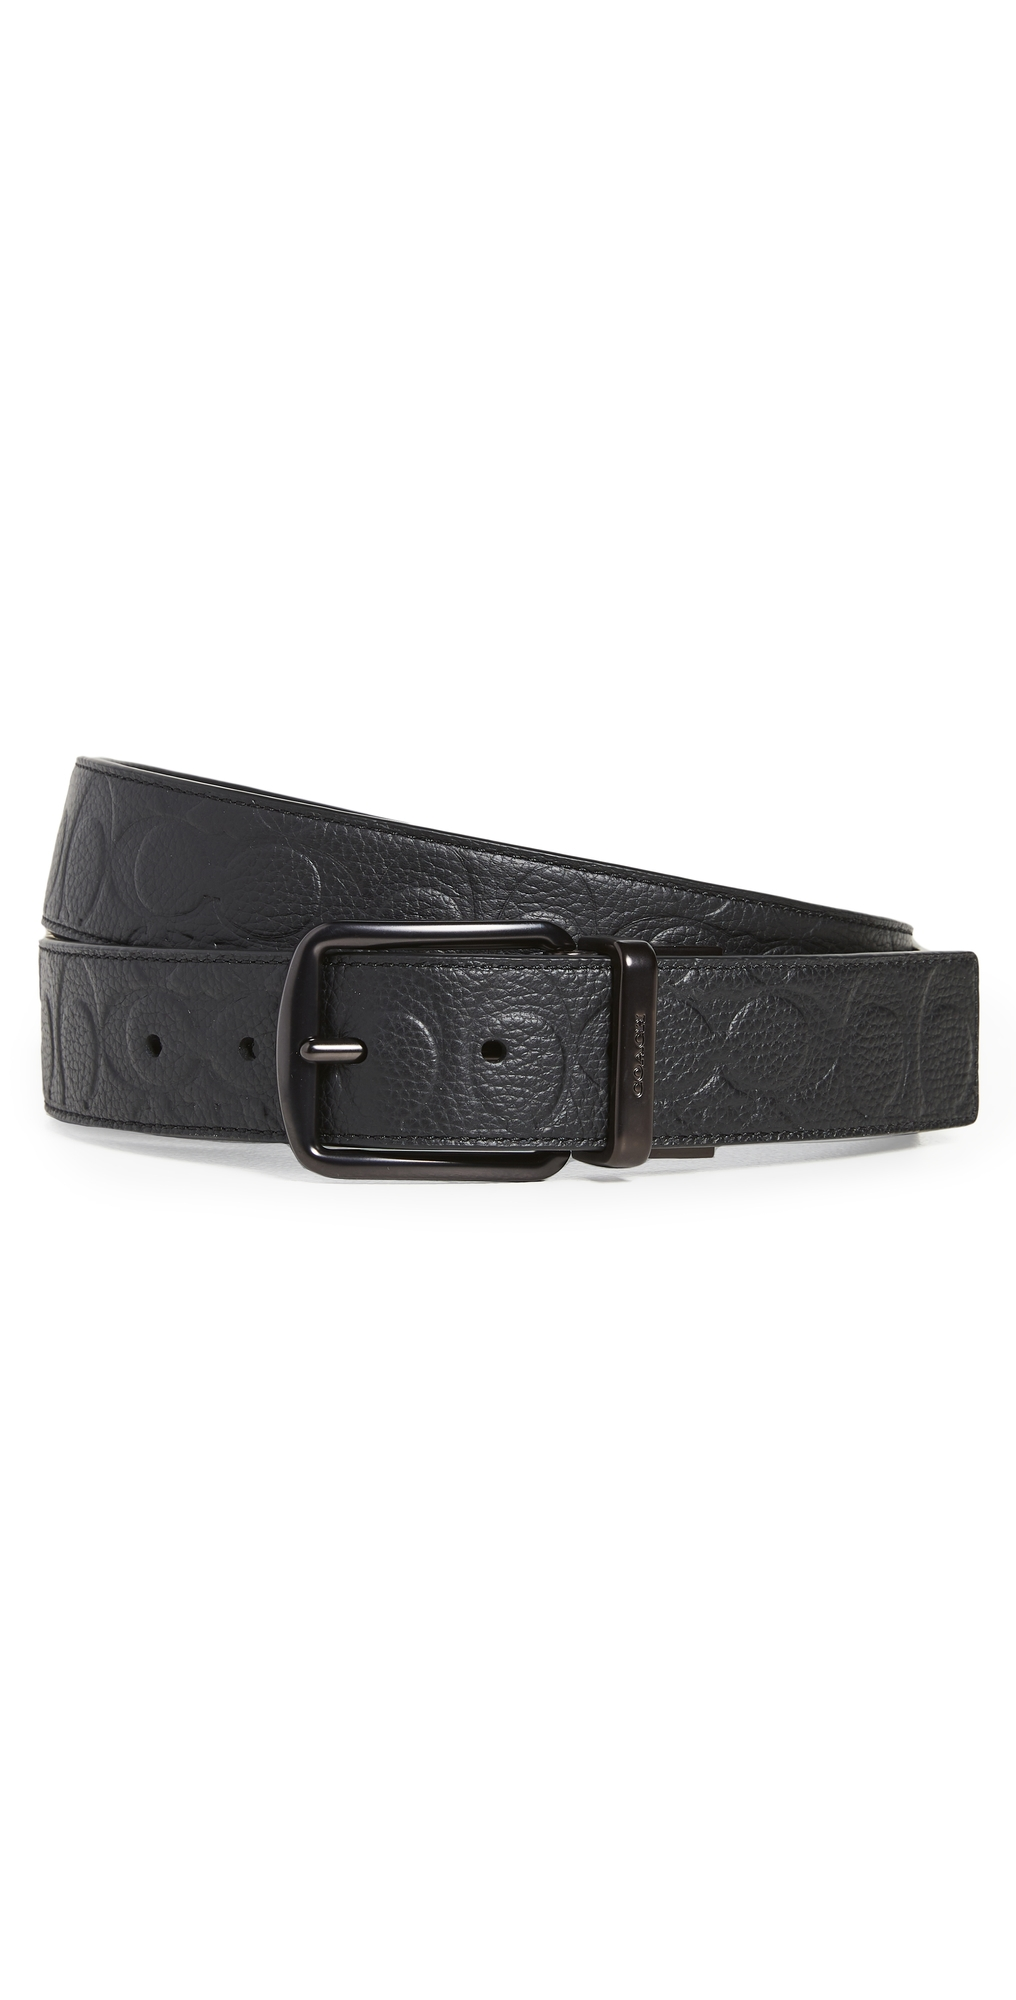 38mm Leather Belt